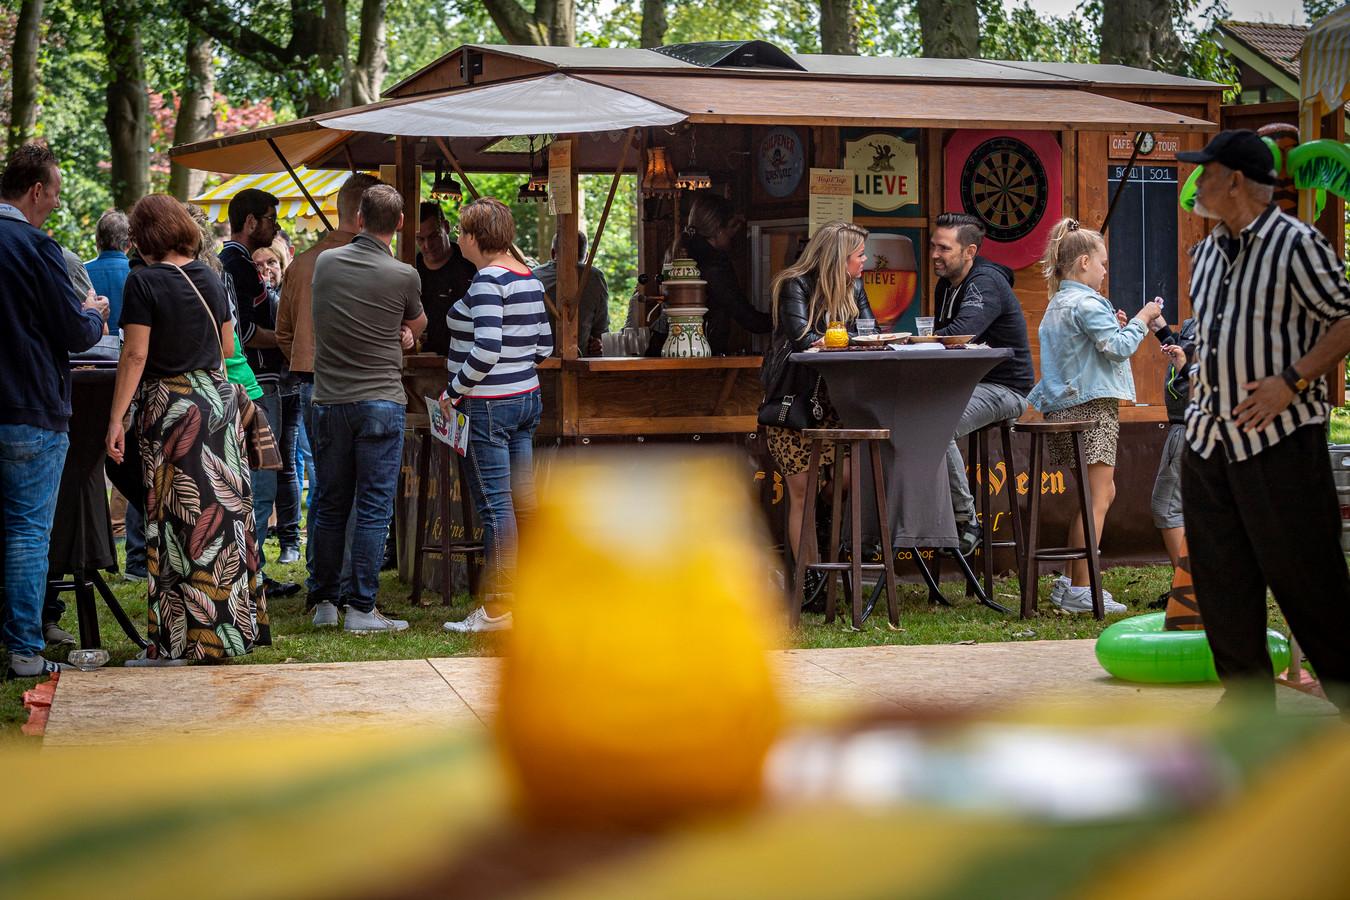 Hap Stap Festival Bovendonk